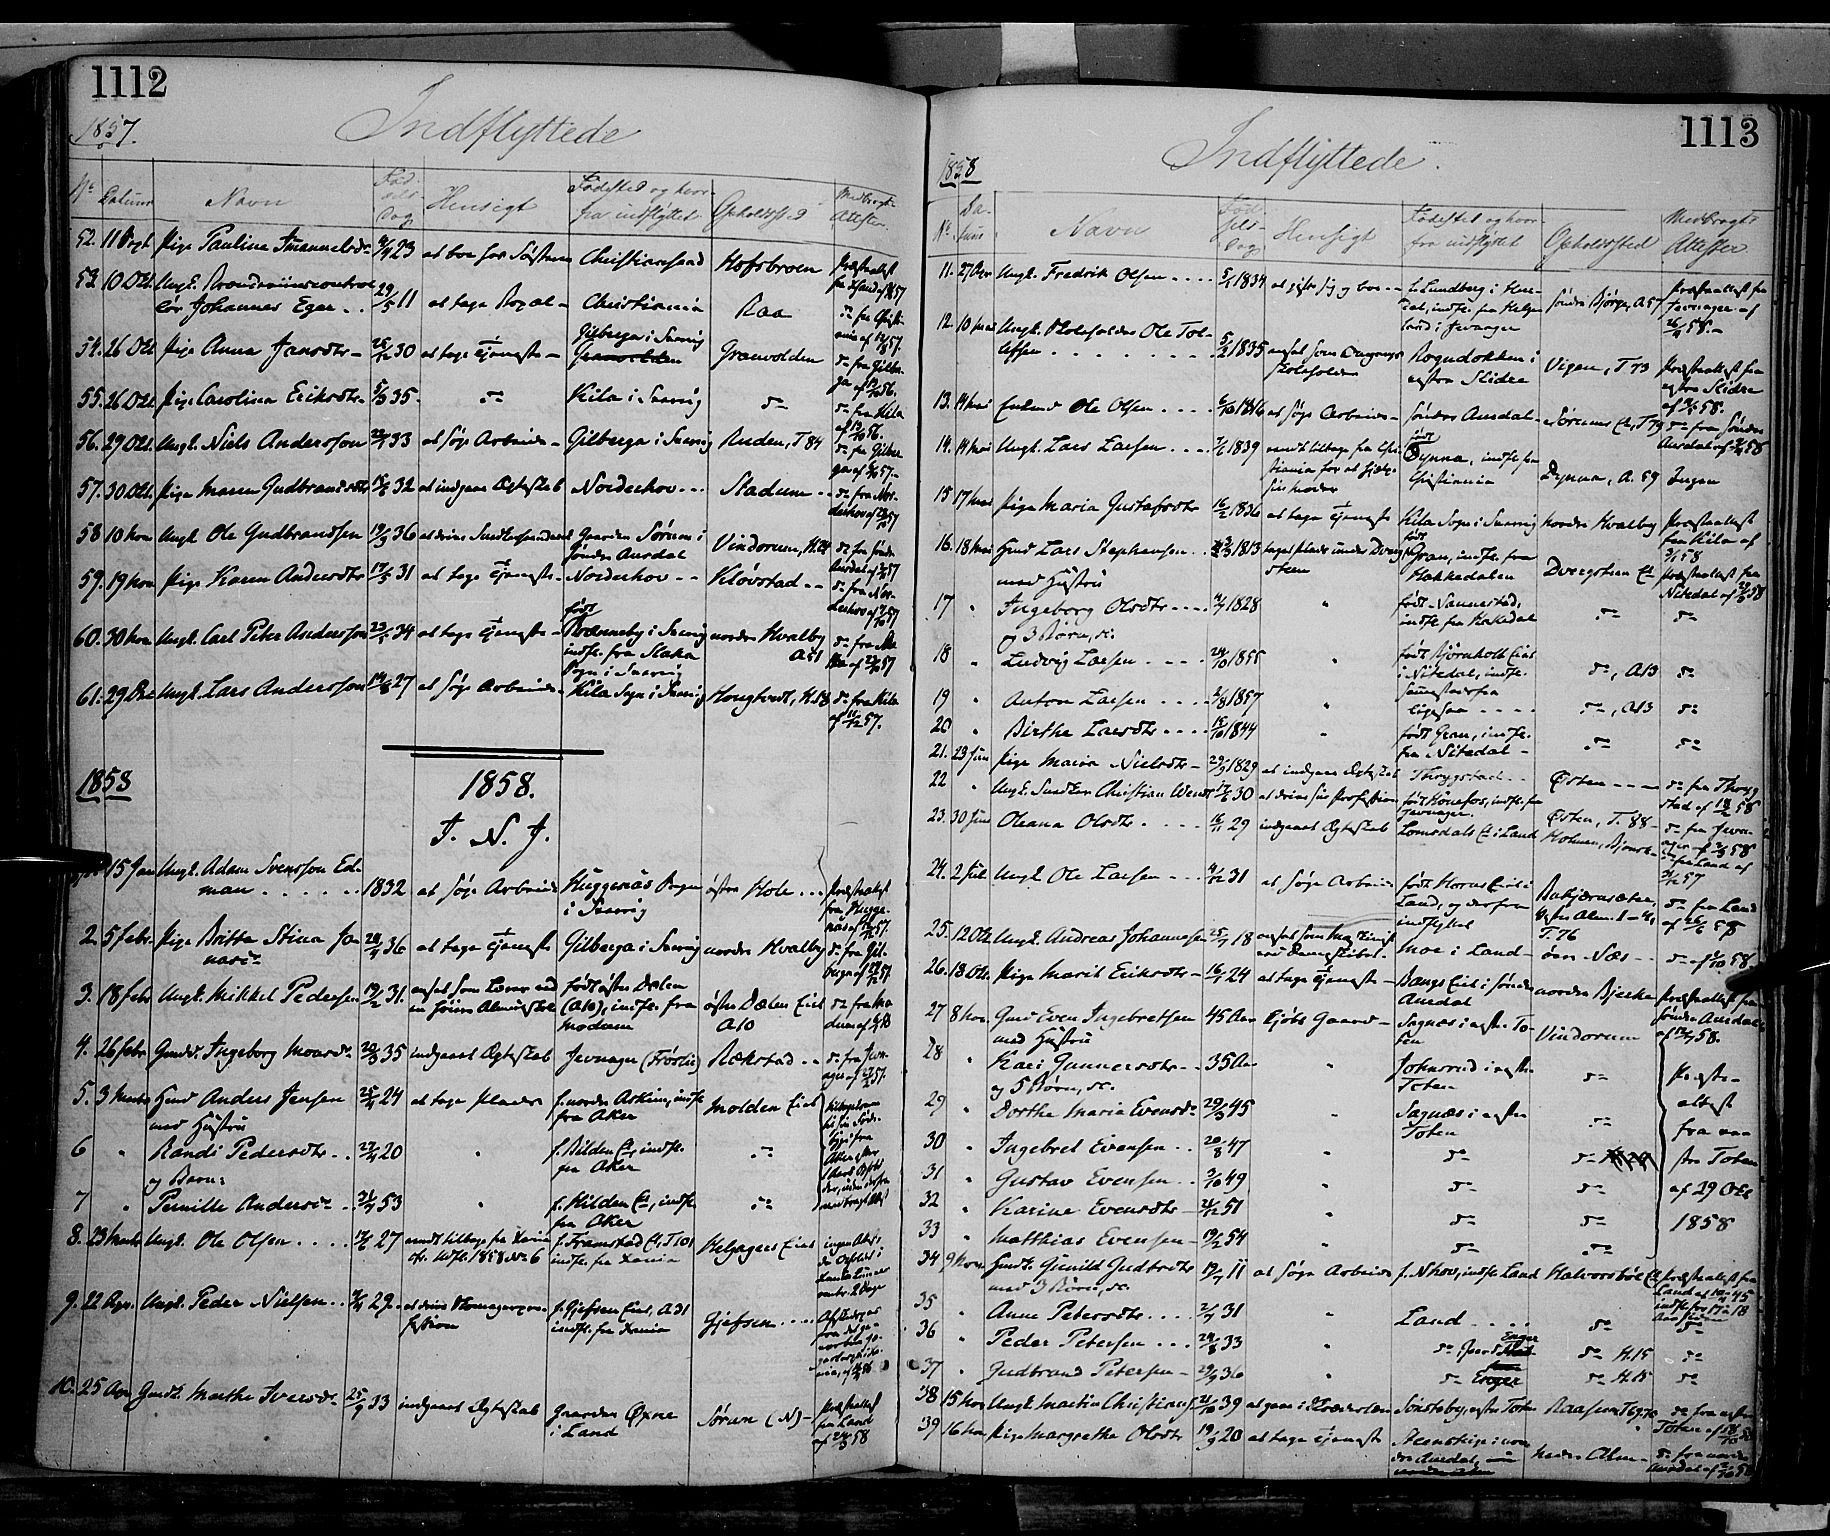 SAH, Gran prestekontor, Ministerialbok nr. 12, 1856-1874, s. 1112-1113